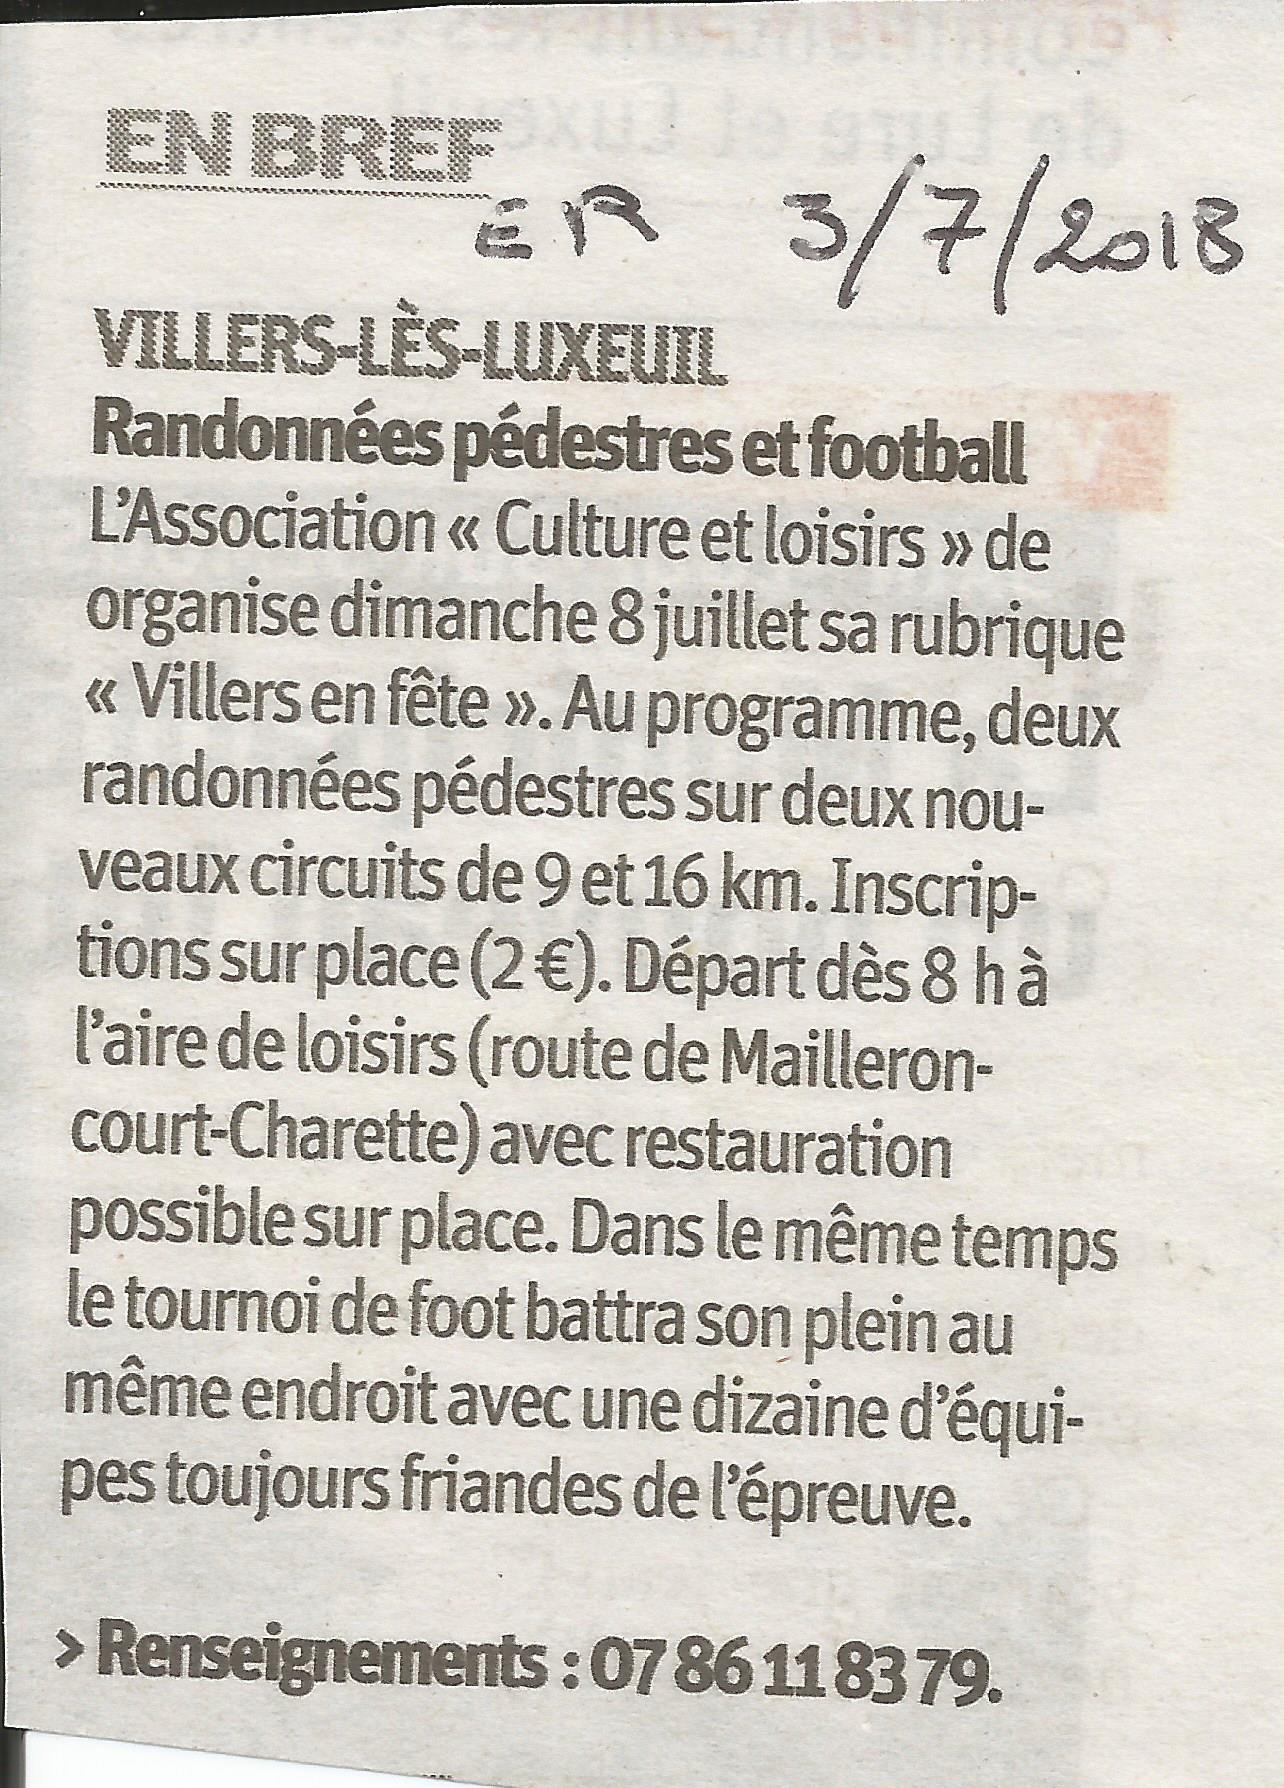 https://www.villers-les-luxeuil.com/projets/villers/files/images/2018_Mairie/Presse/2018_07_03.jpg